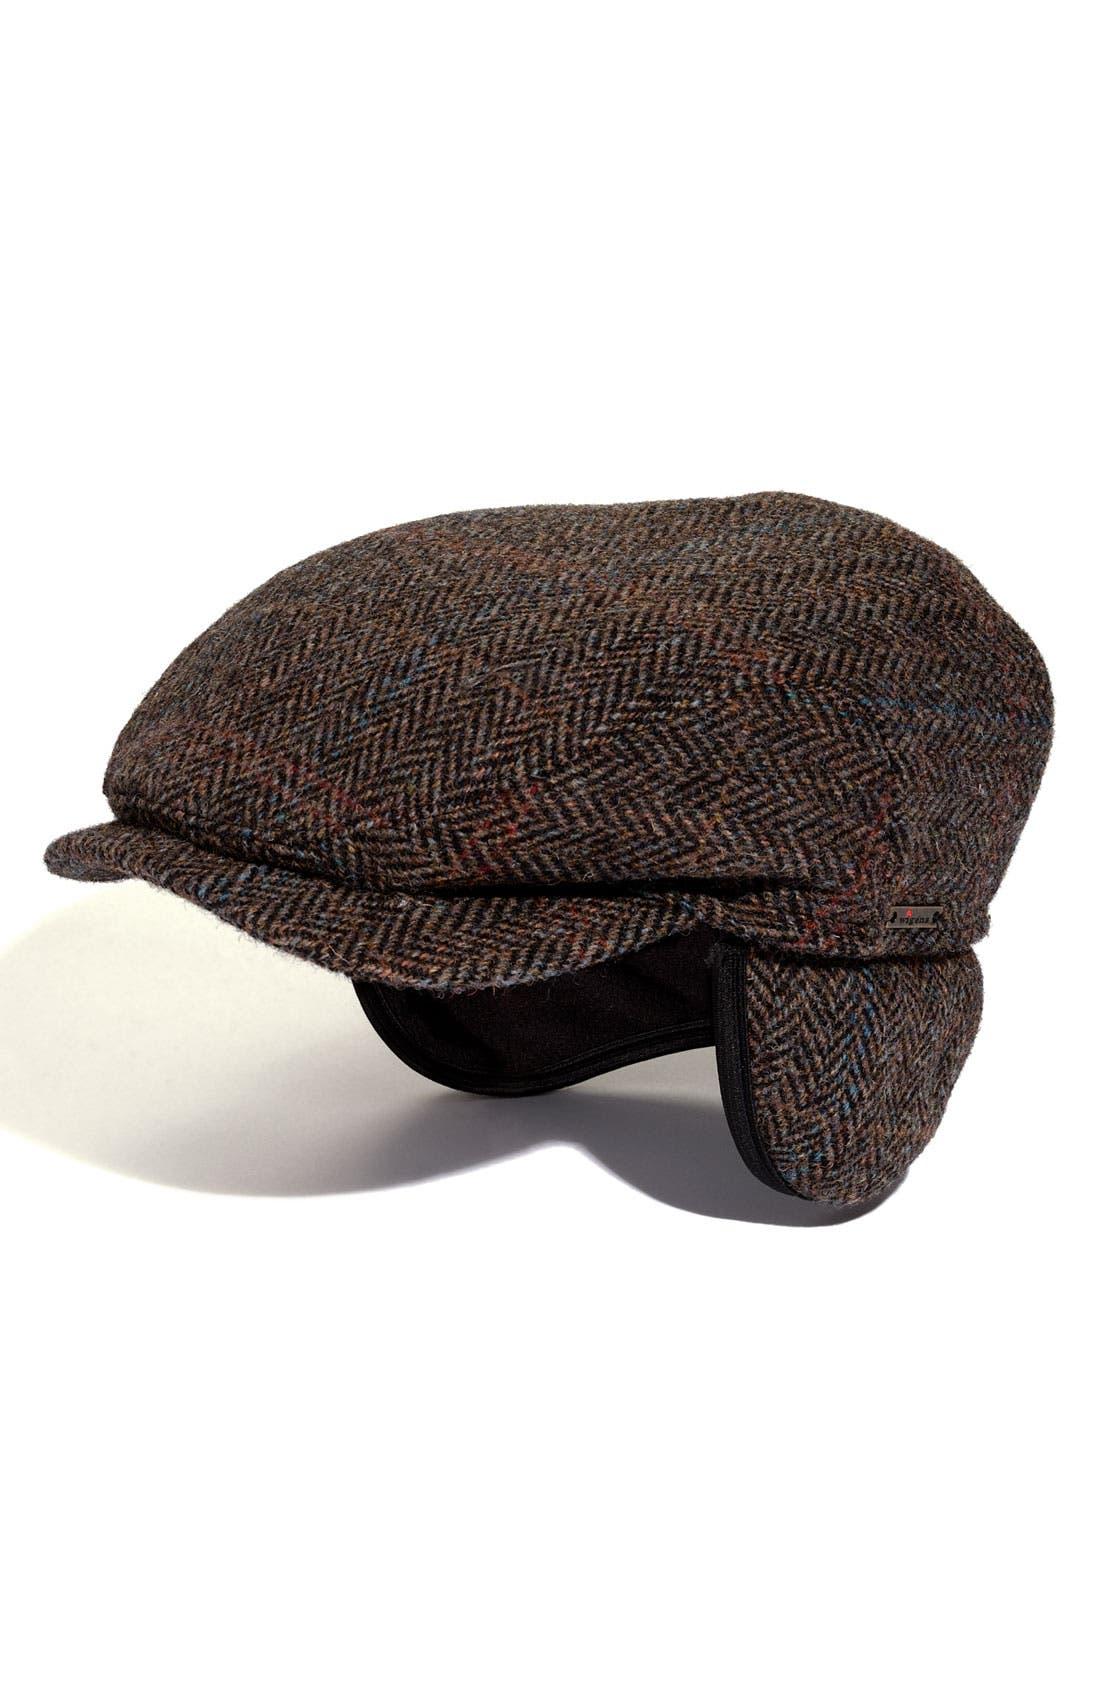 Alternate Image 1 Selected - Wigens Plaid Wool Cap